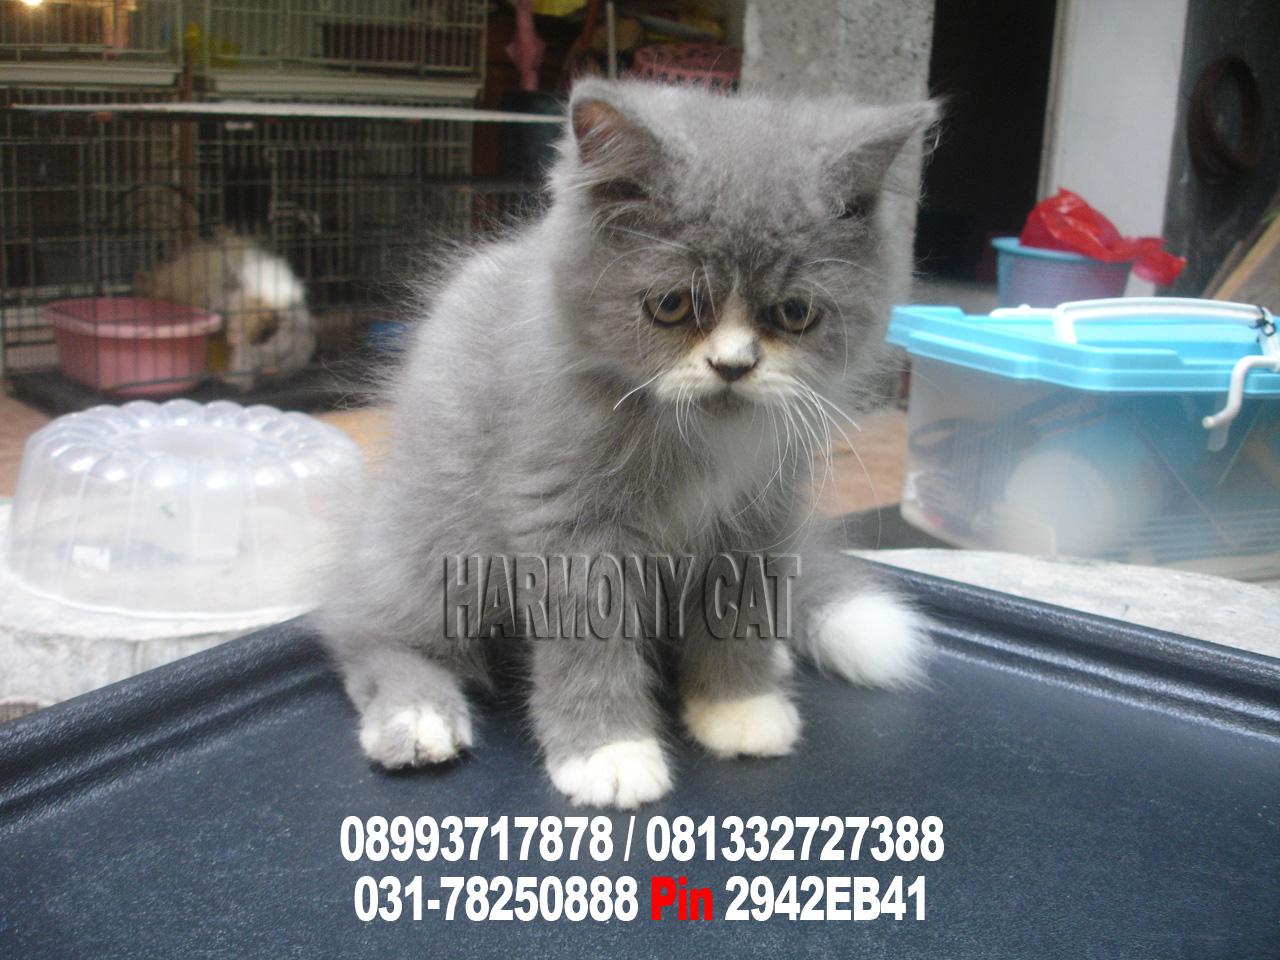 Pin Jual Kucing Murah 150ribuan Bogorjakarta Selatan On